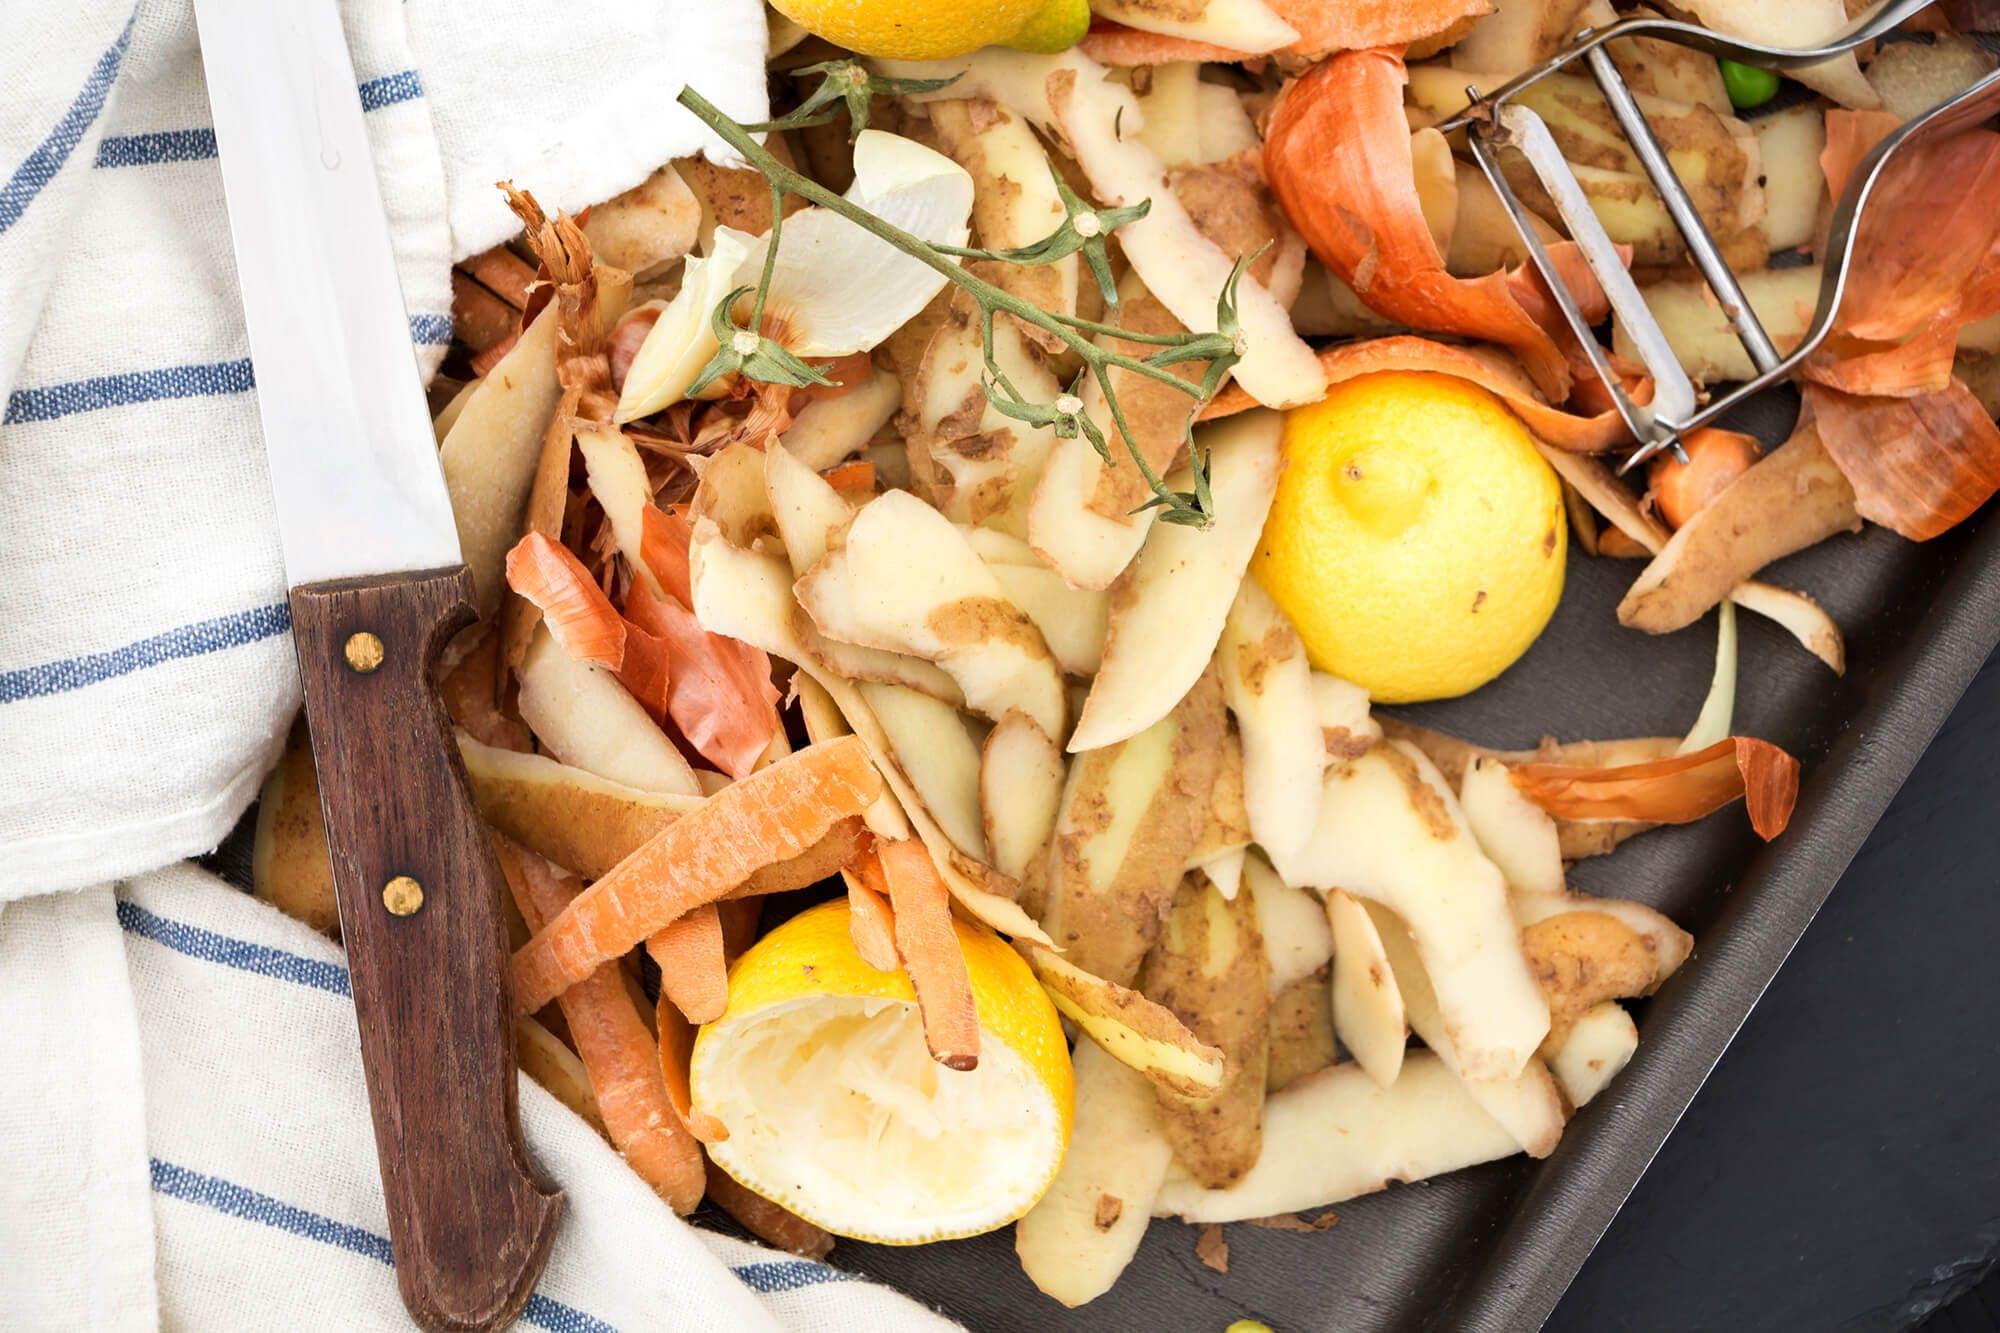 Residuos orgánicos en una mesa con un cuchillo